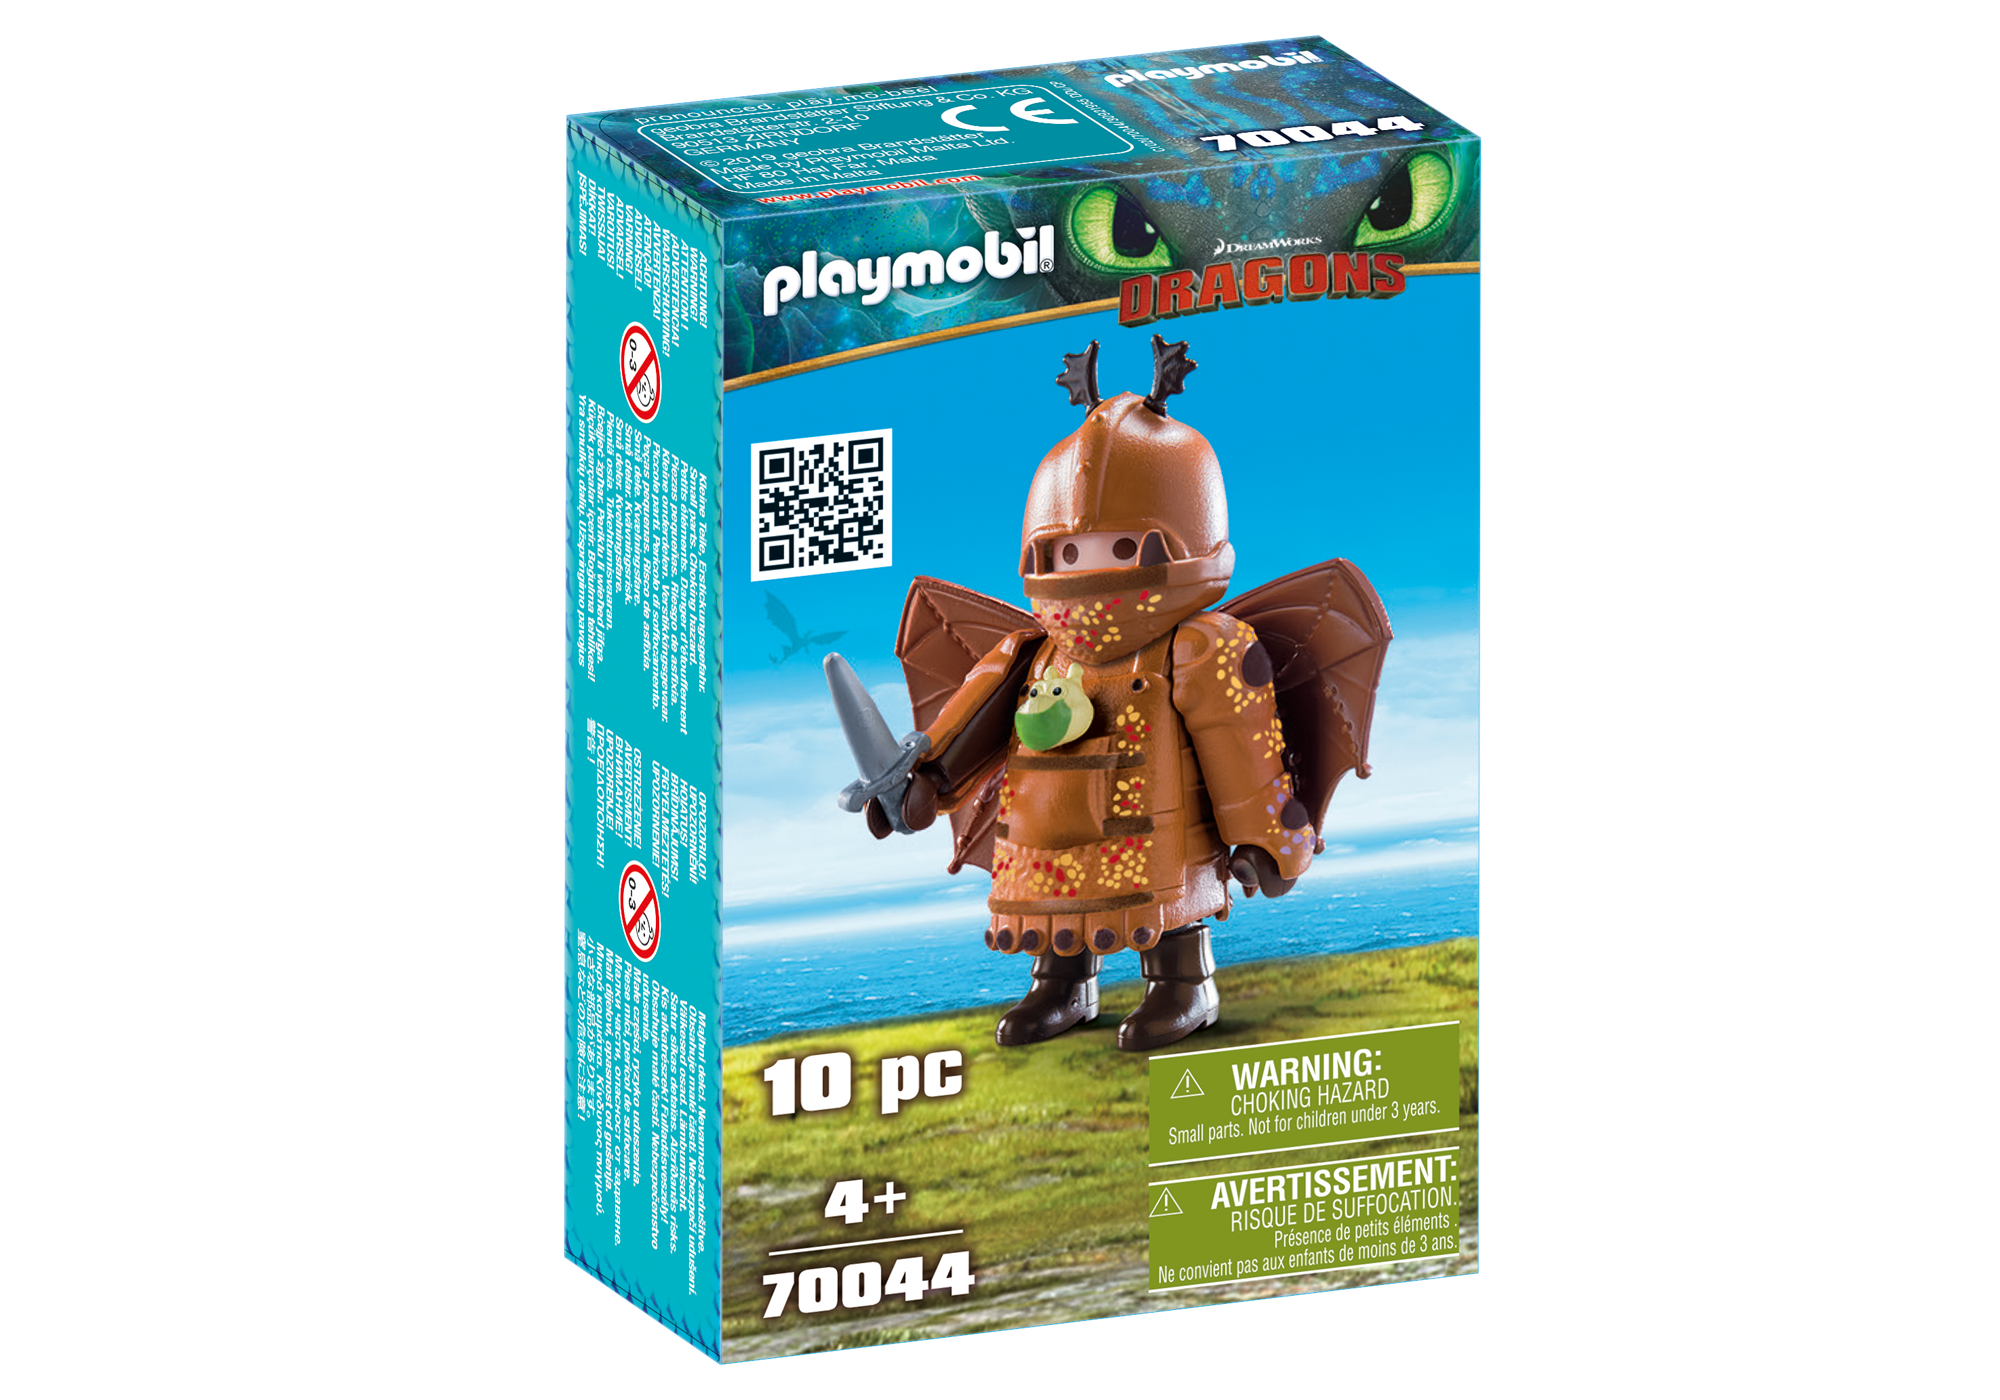 http://media.playmobil.com/i/playmobil/70044_product_box_front/Fiskeben i flyveuniform / Fishlegs in flight uniform